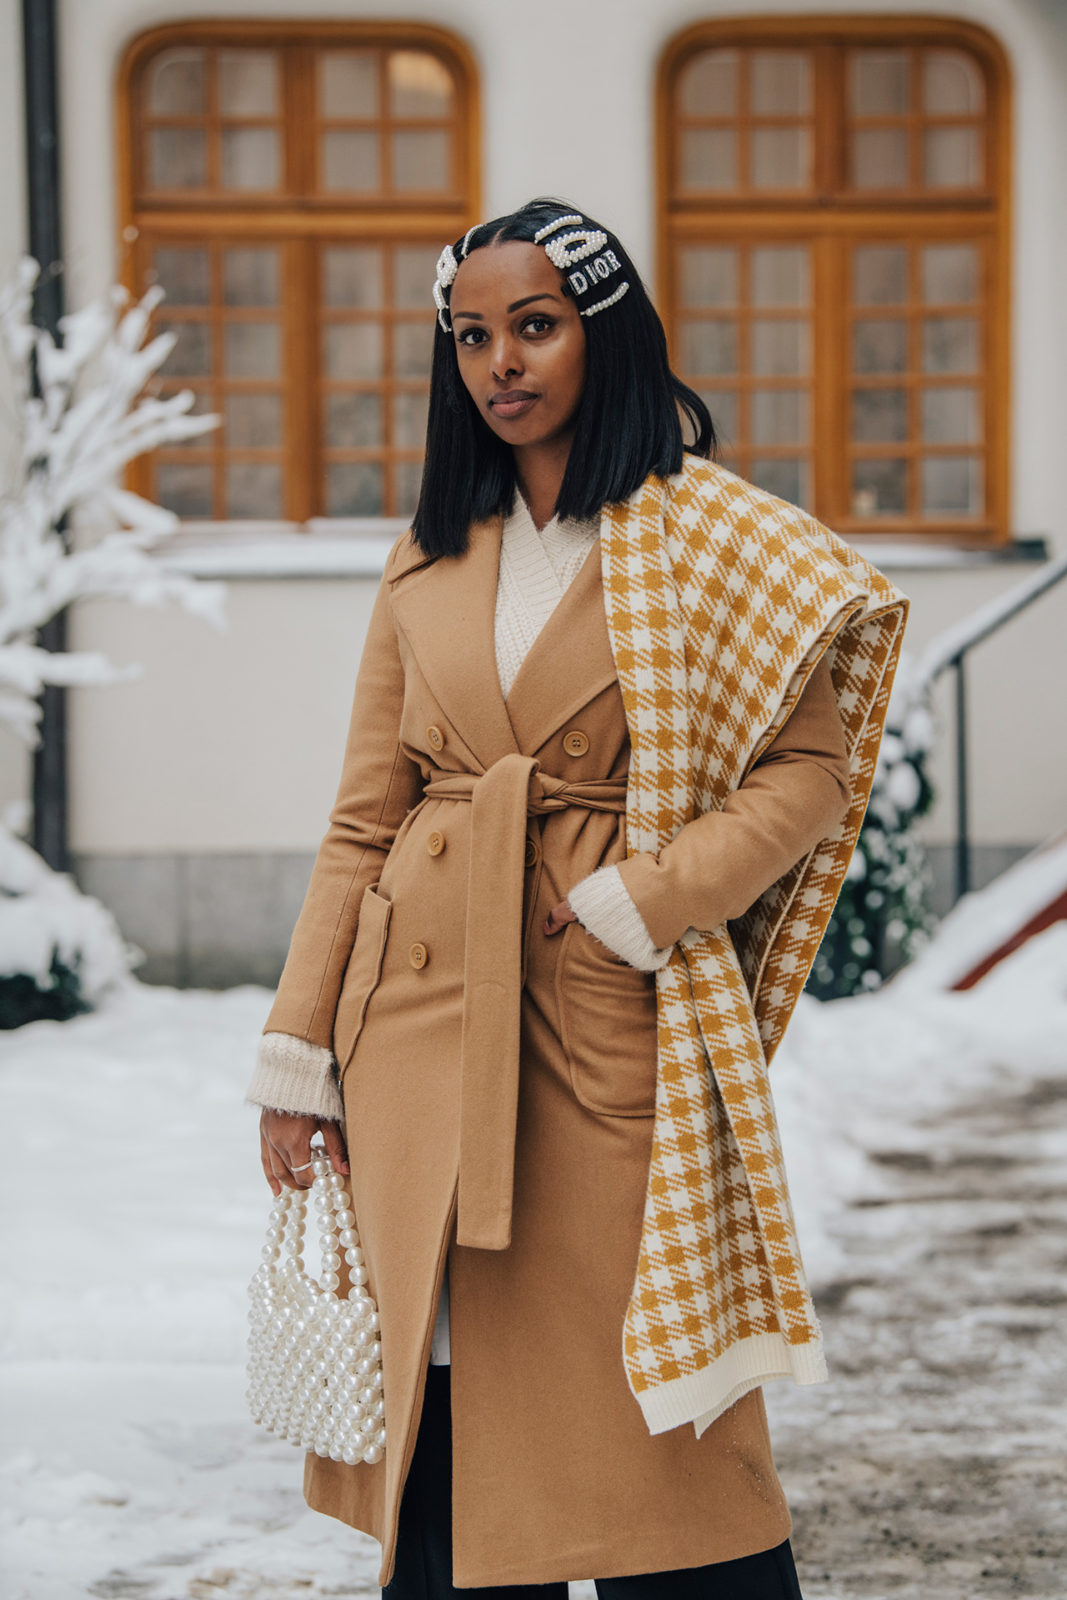 Inspirasi Padu-padan Outfit Musim Dingin yang Fashionable